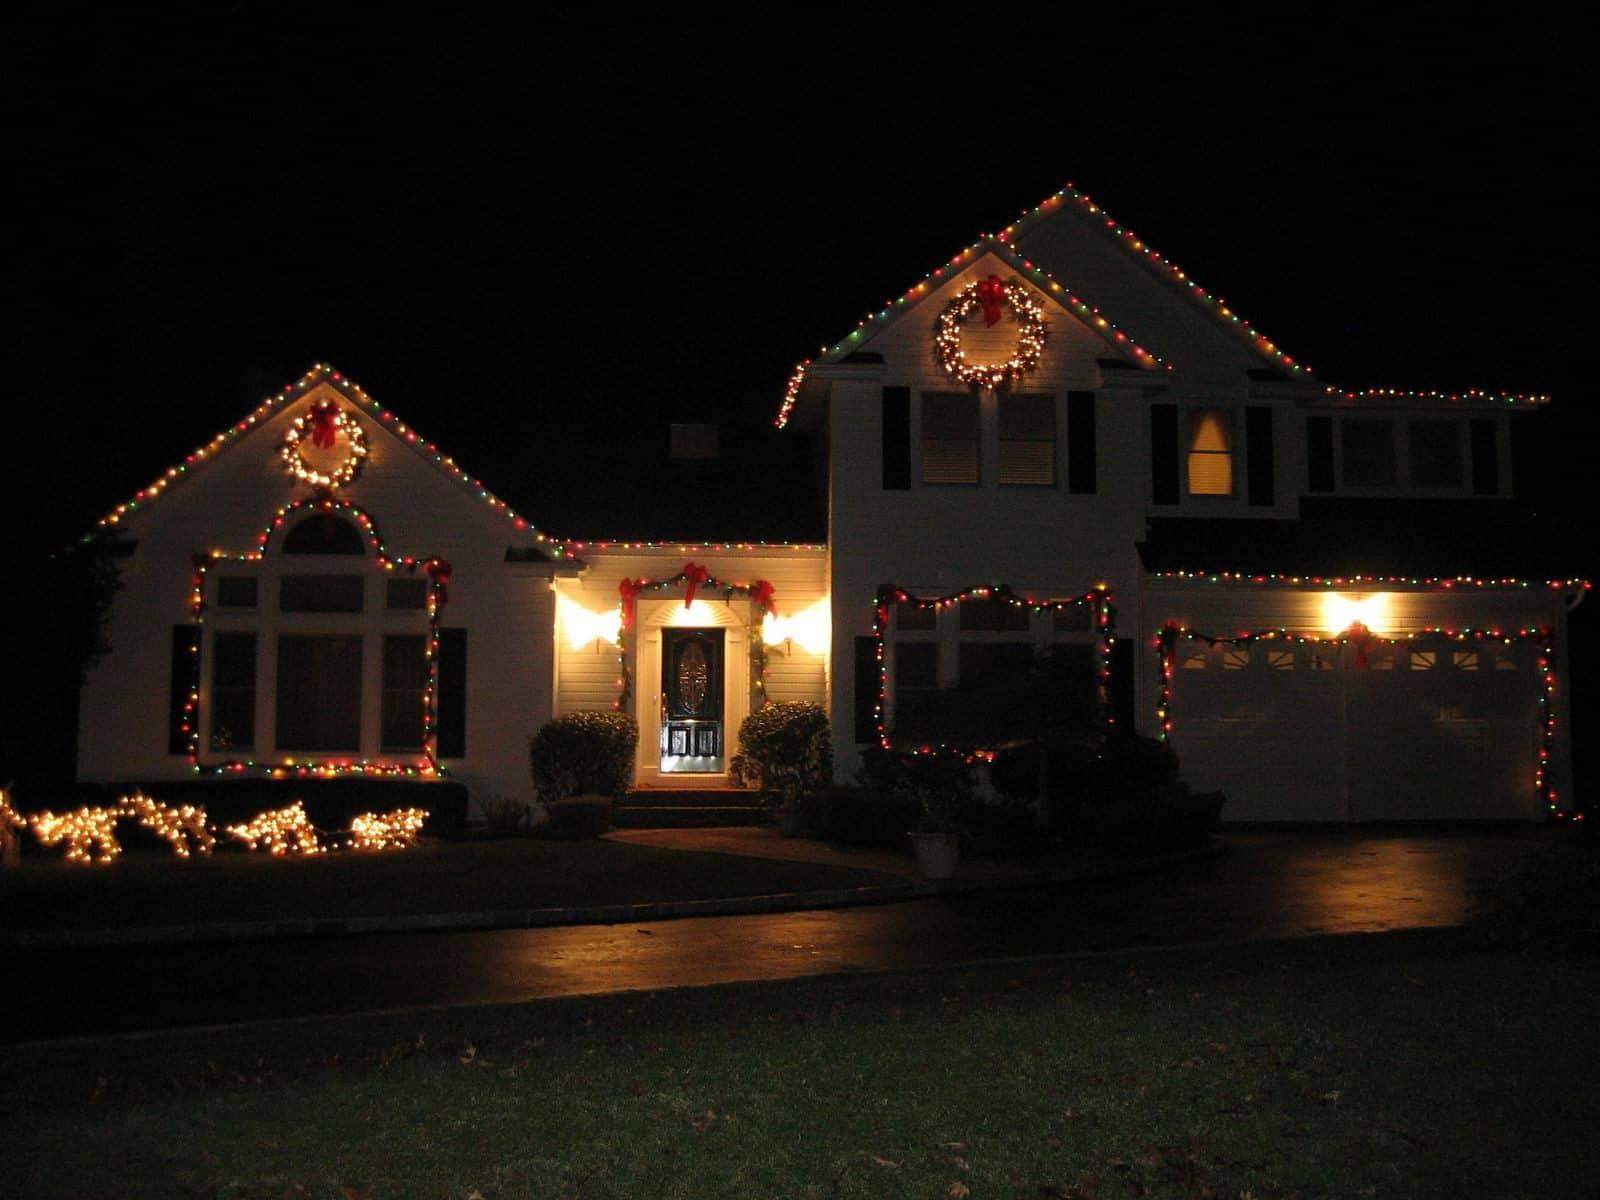 Holiday Lights Outdoors in Bridgehampton, Long Island NY